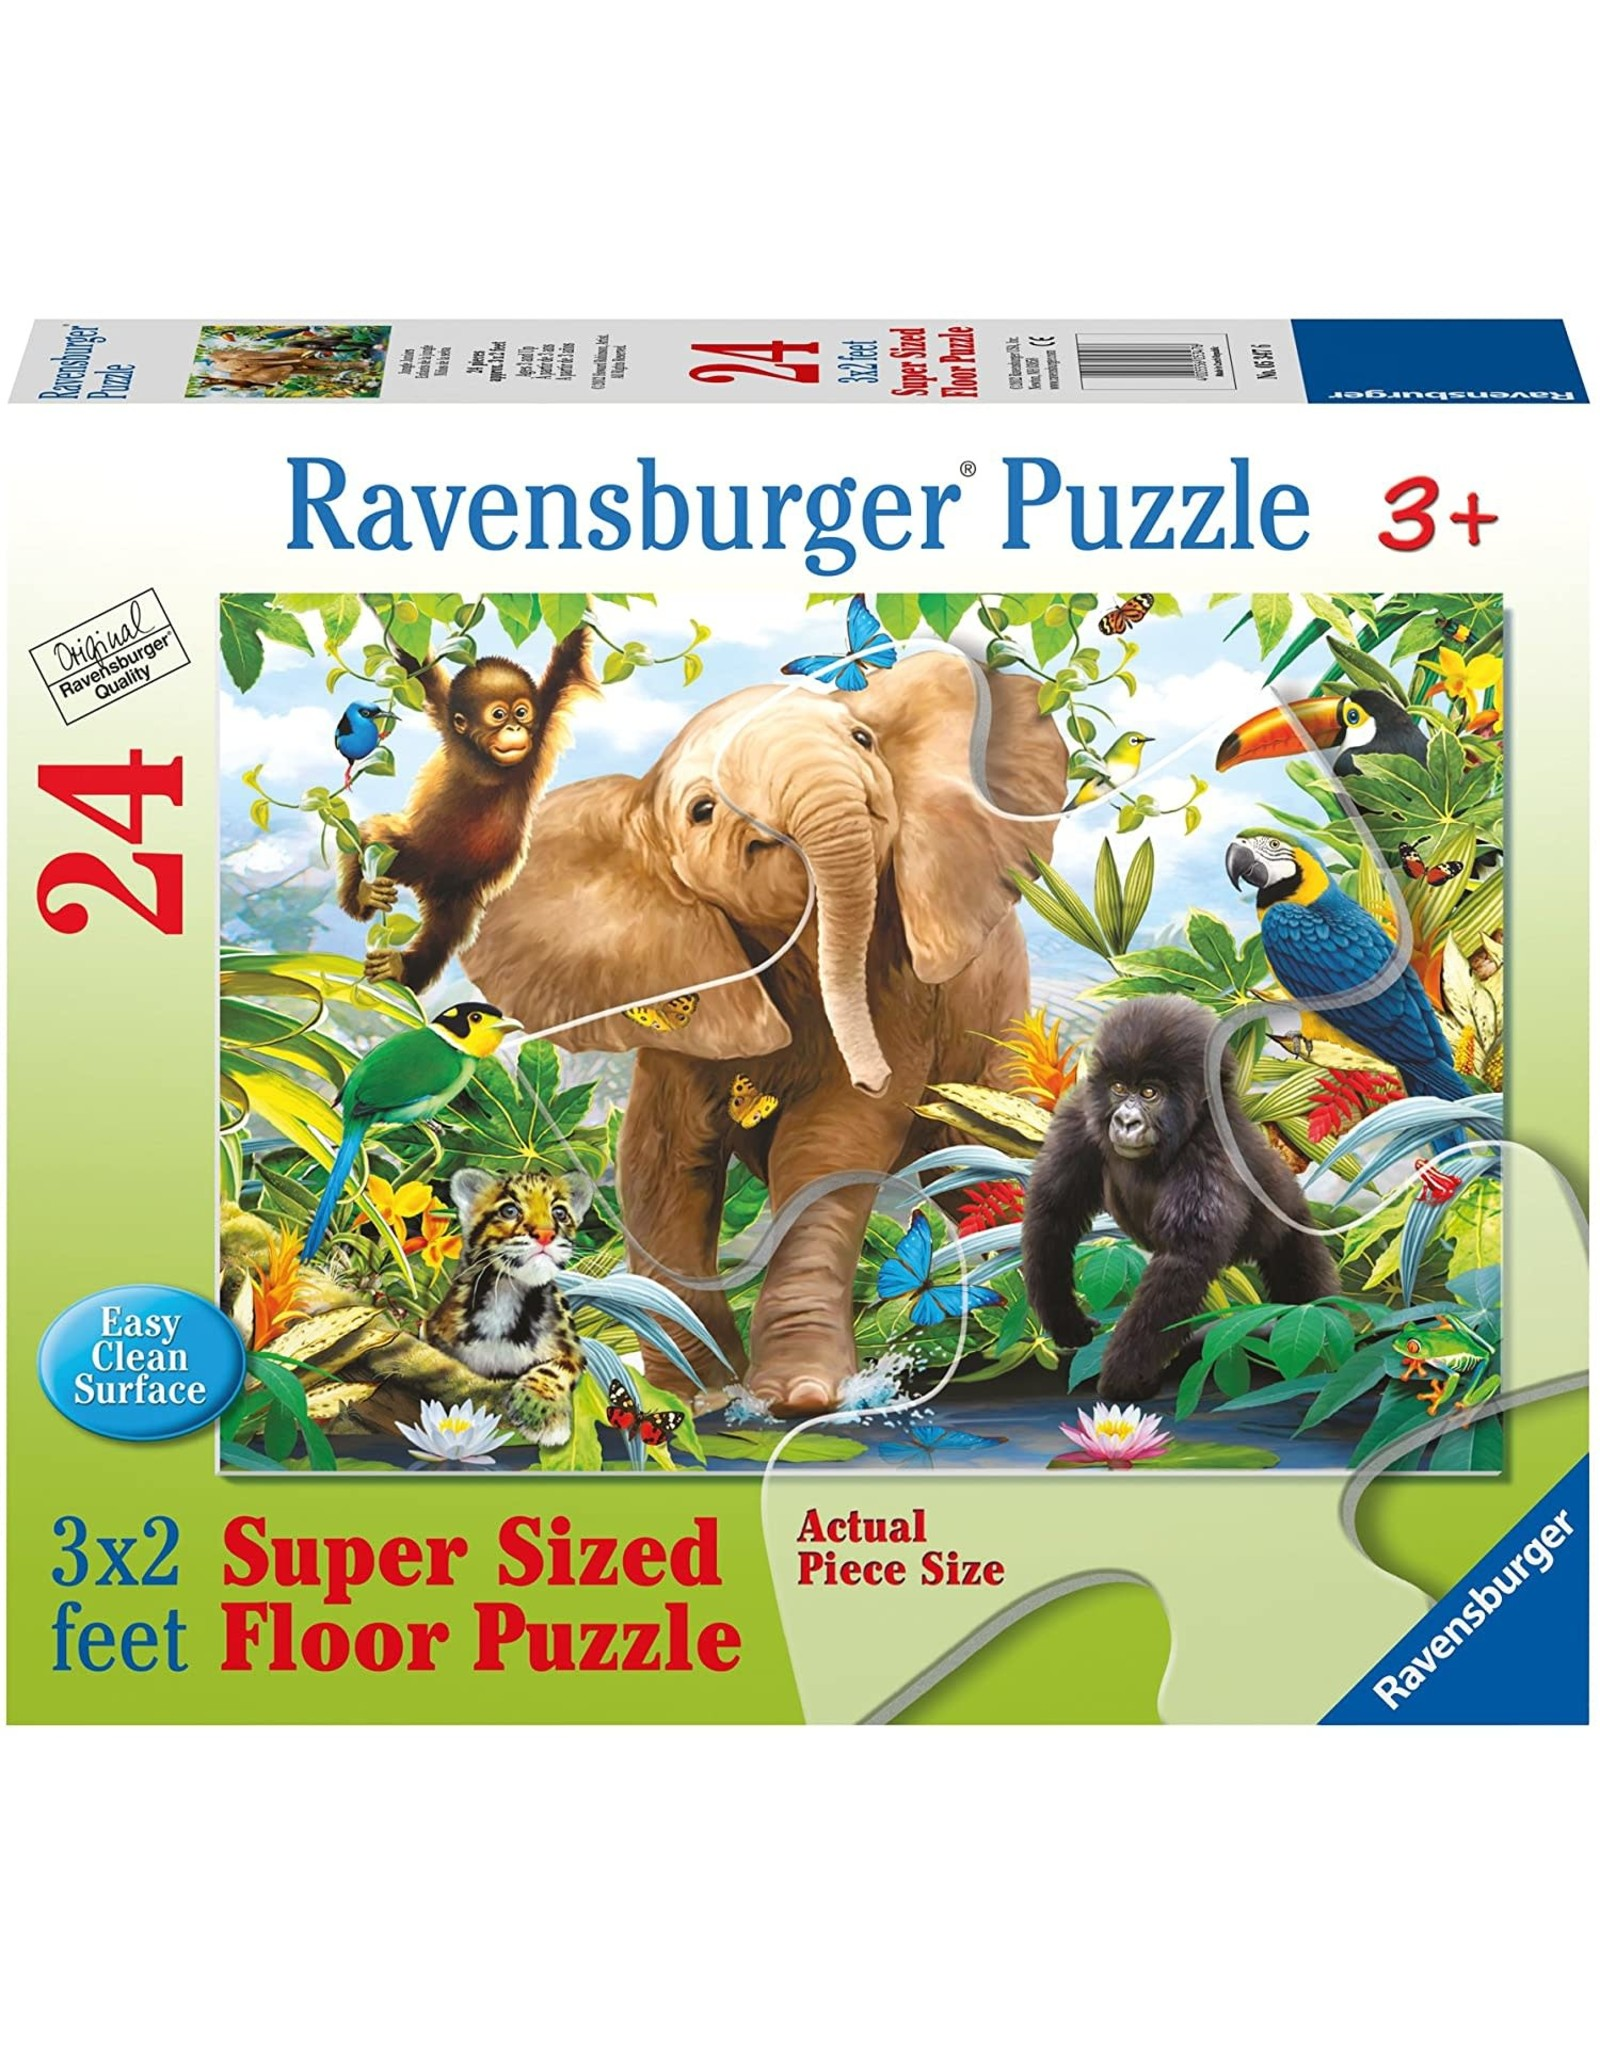 Ravensburger 24 pcs. Jungle Juniors Puzzle